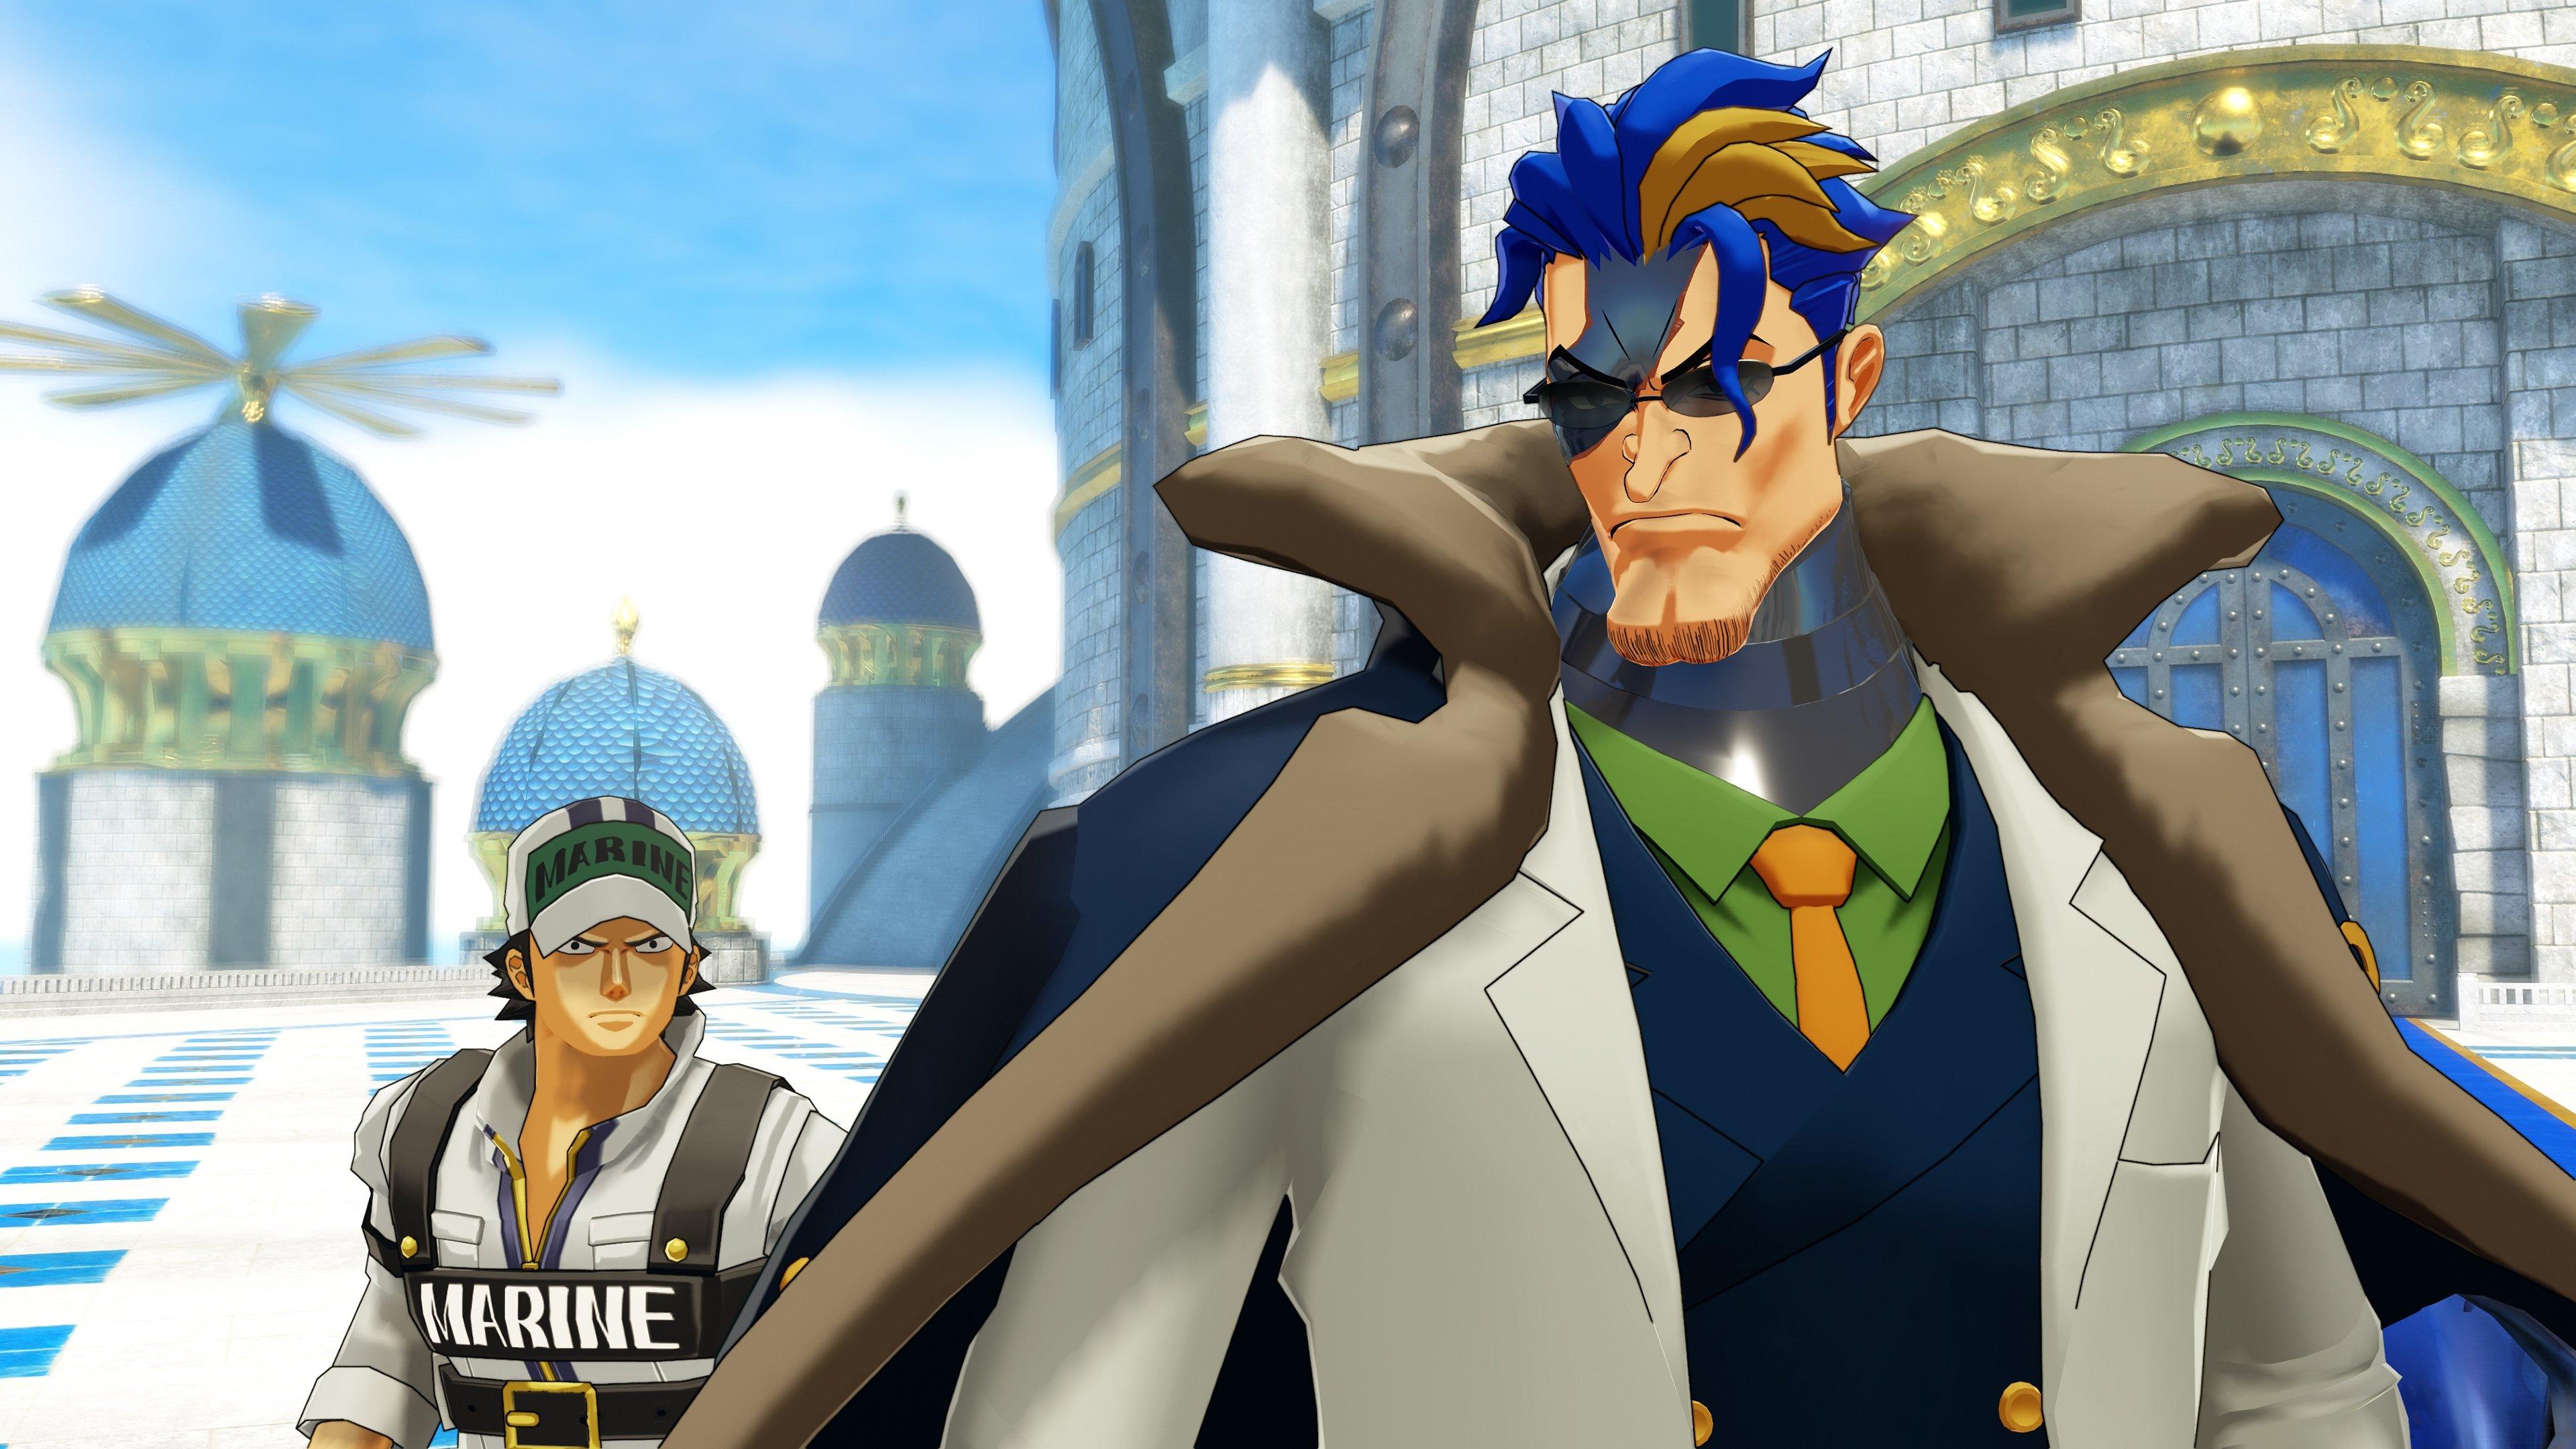 tokyo-game-show-mira-el-trailer-de-one-piece-world-seeker2-frikigamers.com